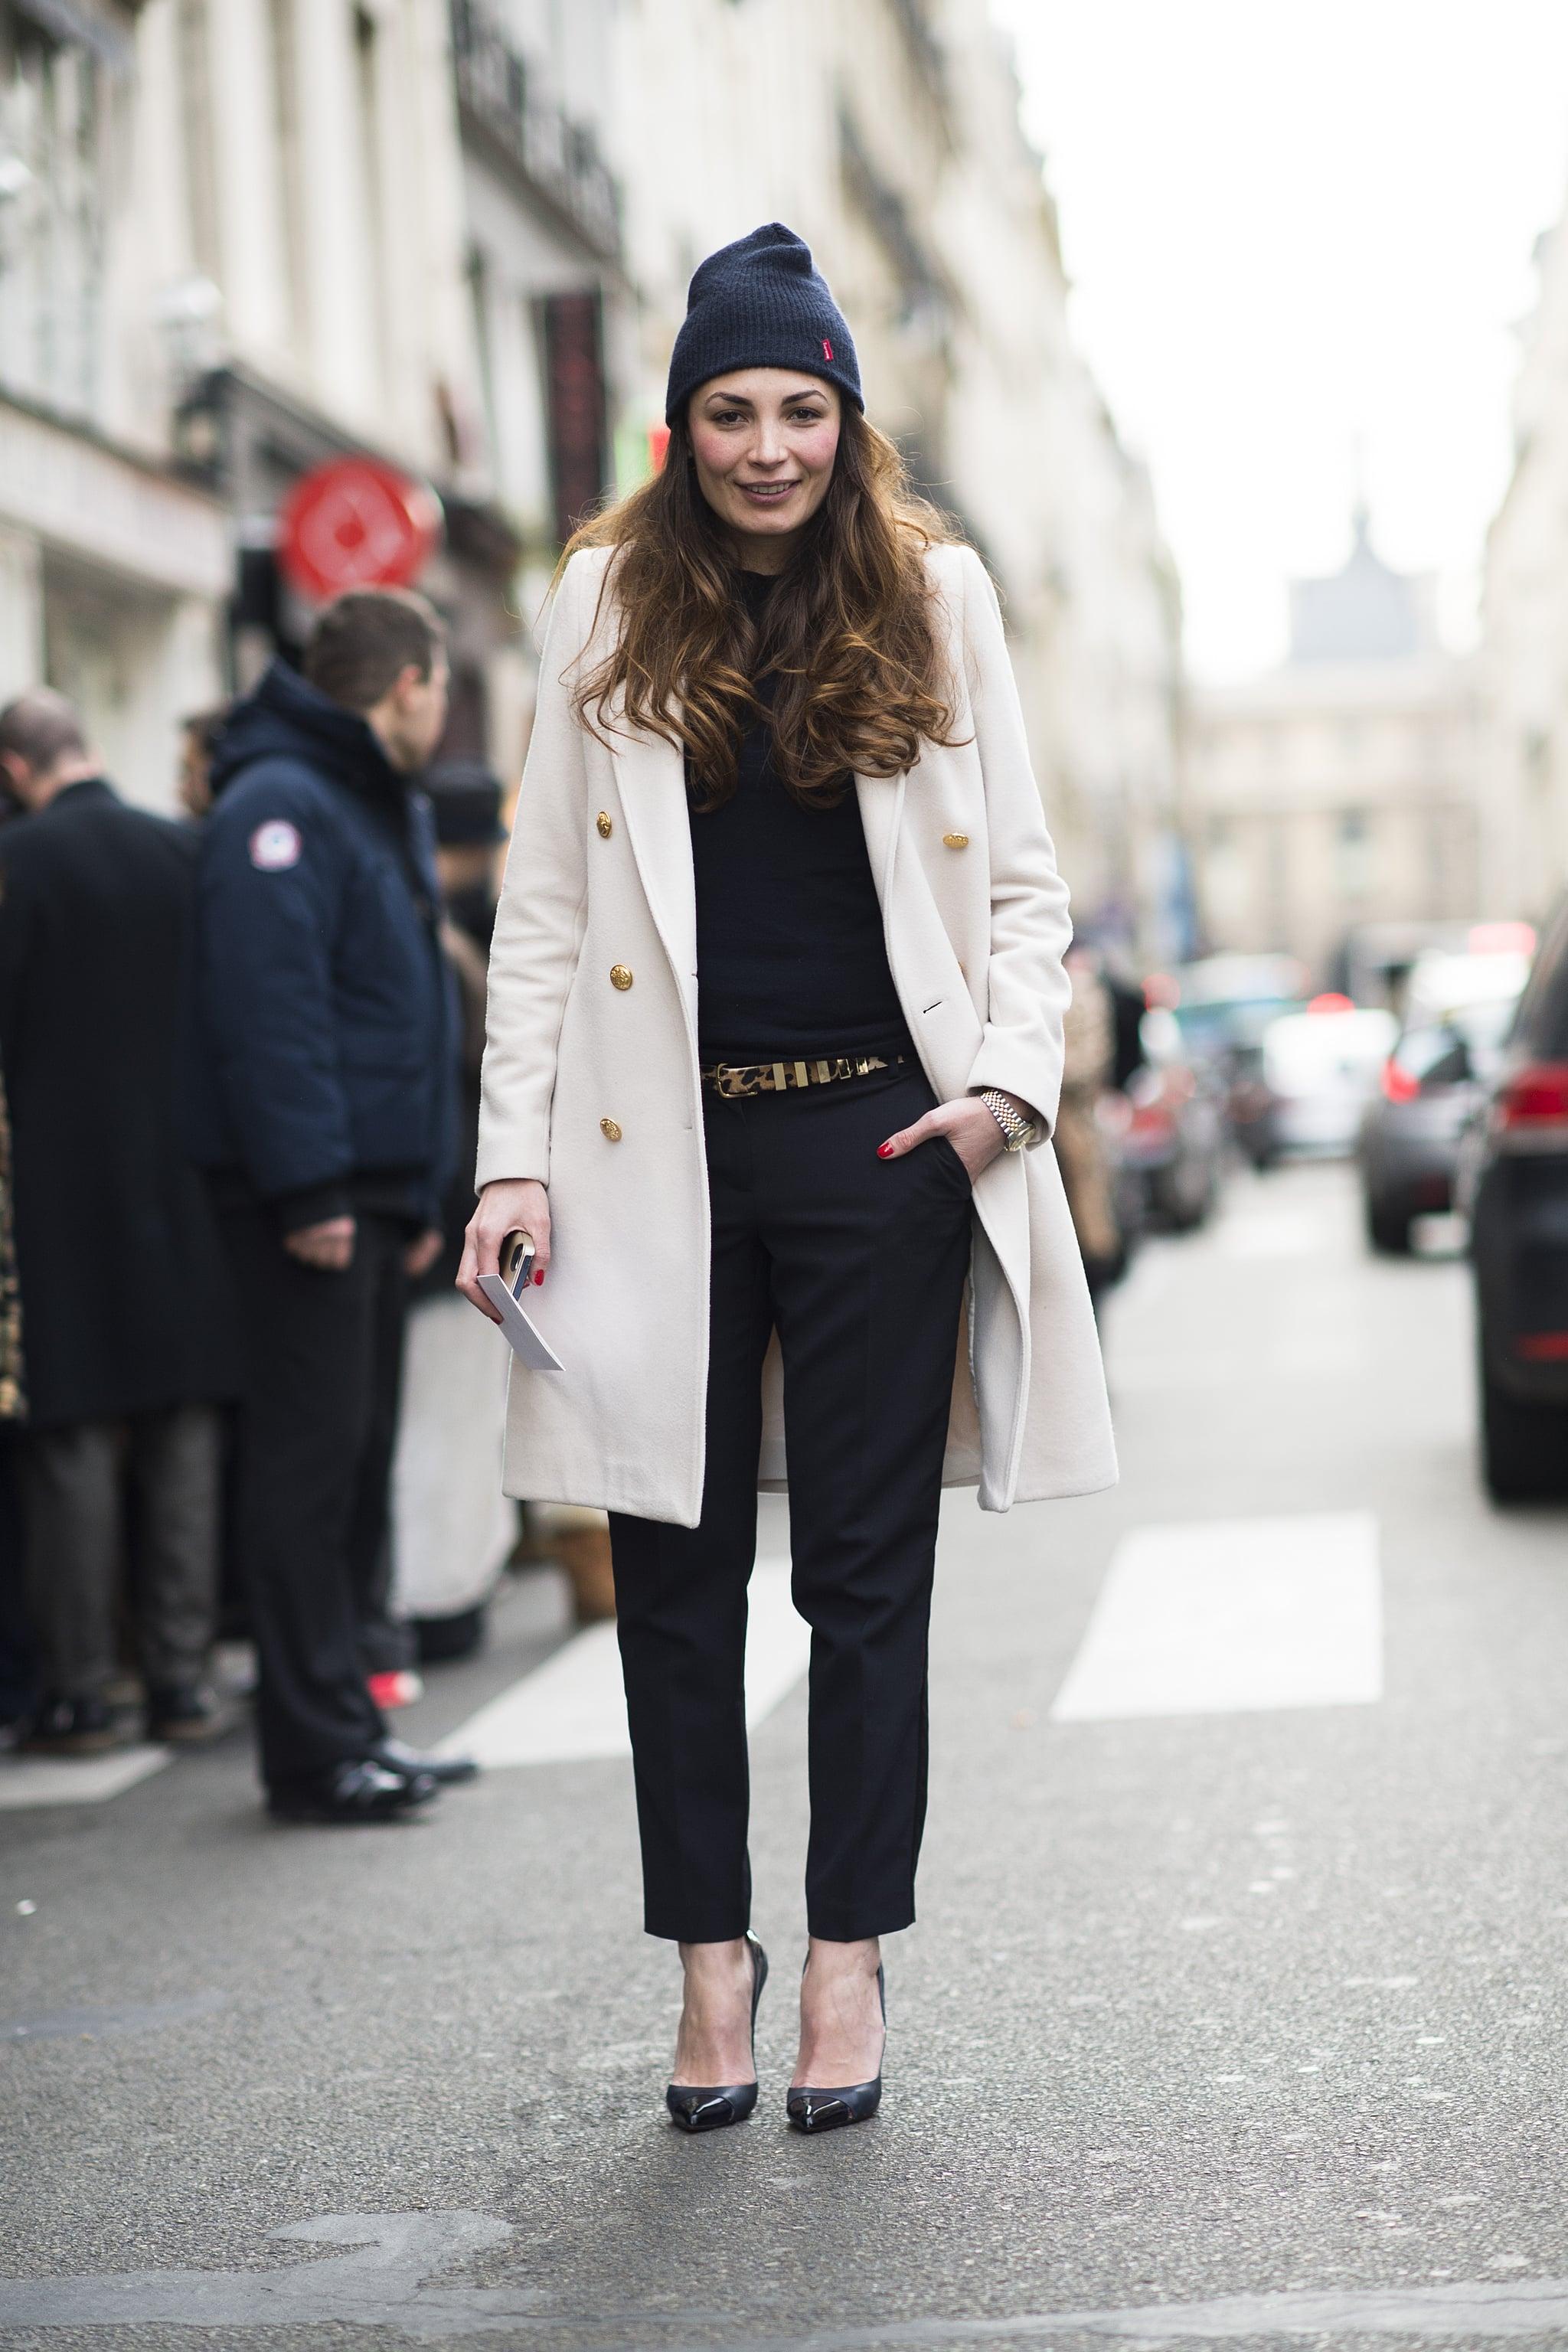 When in doubt, a beanie makes the best accessory. Source: Le 21ème | Adam Katz Sinding